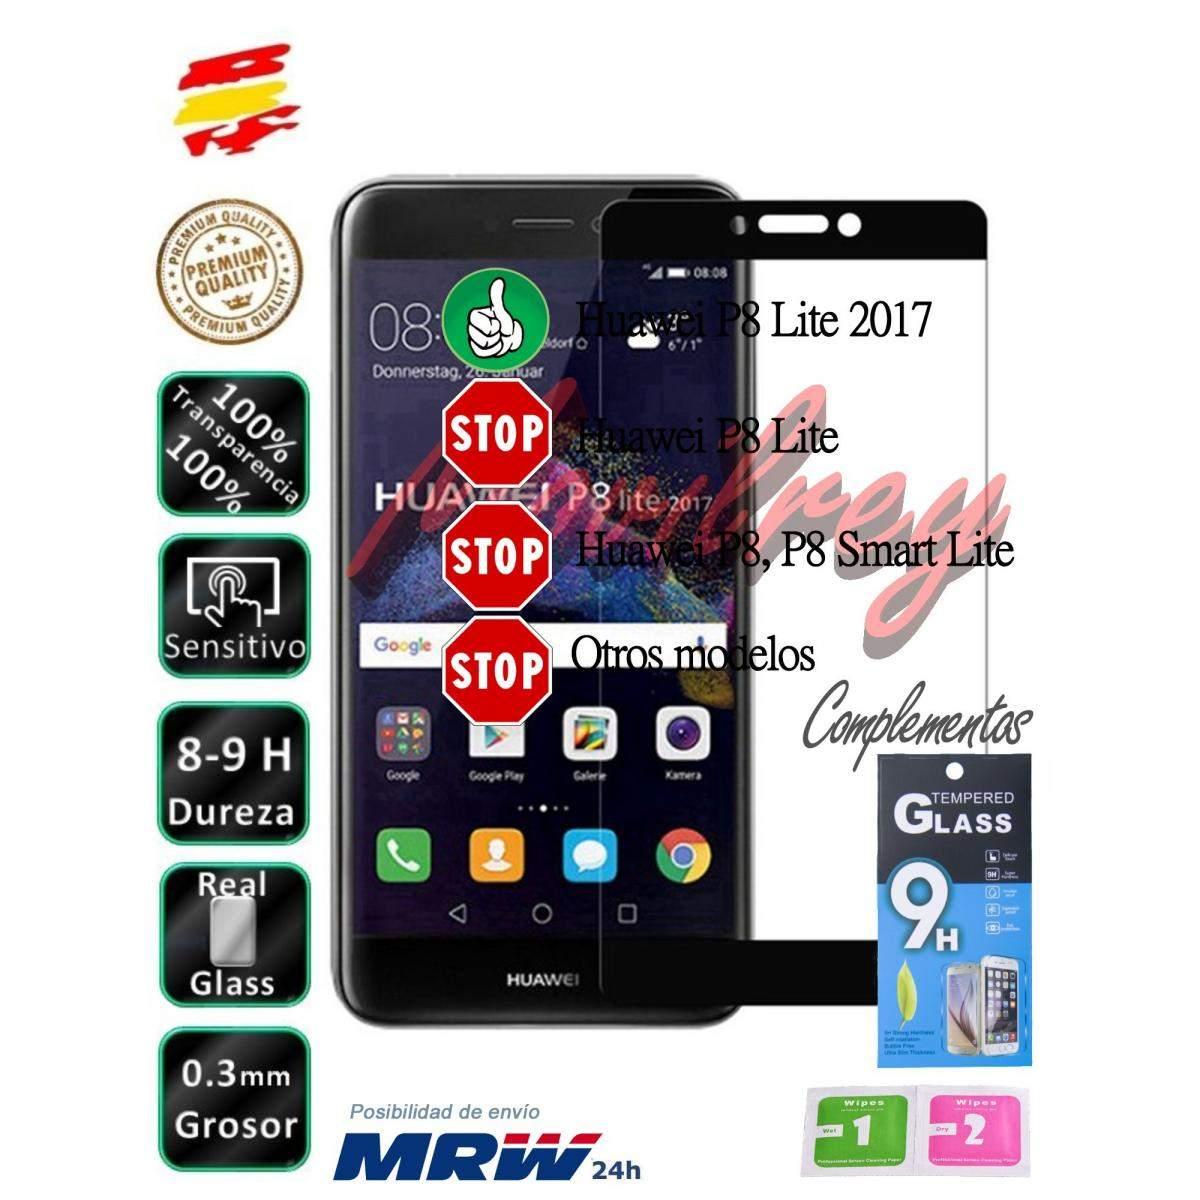 fd0f9ff6df6 Set Protector de Pantalla Cristal Templado Completo Huawei P8 Lite 2017  Negro